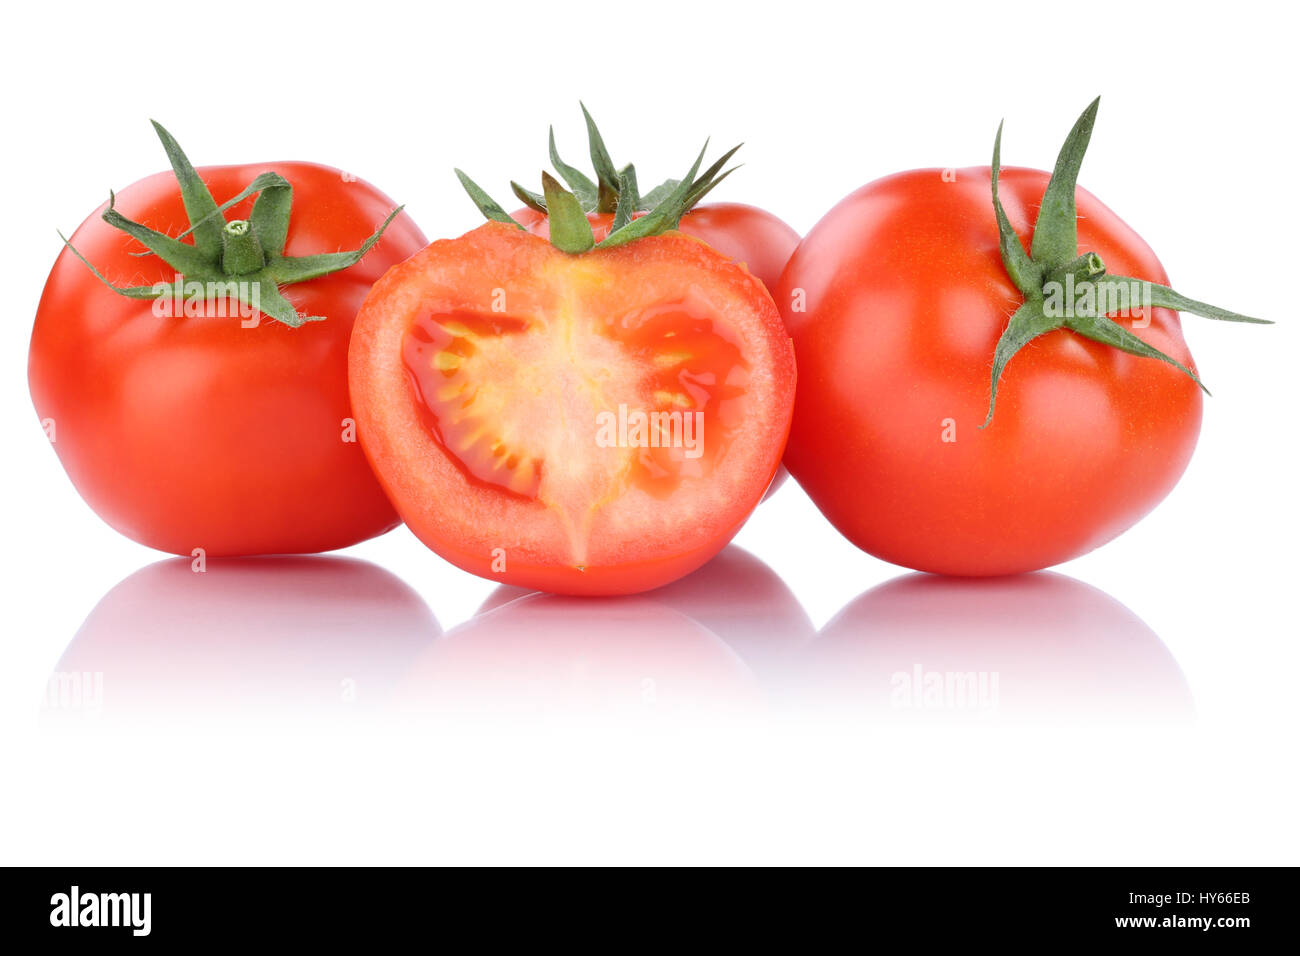 Tomatoes sliced slice fresh vegetable isolated on a white background - Stock Image